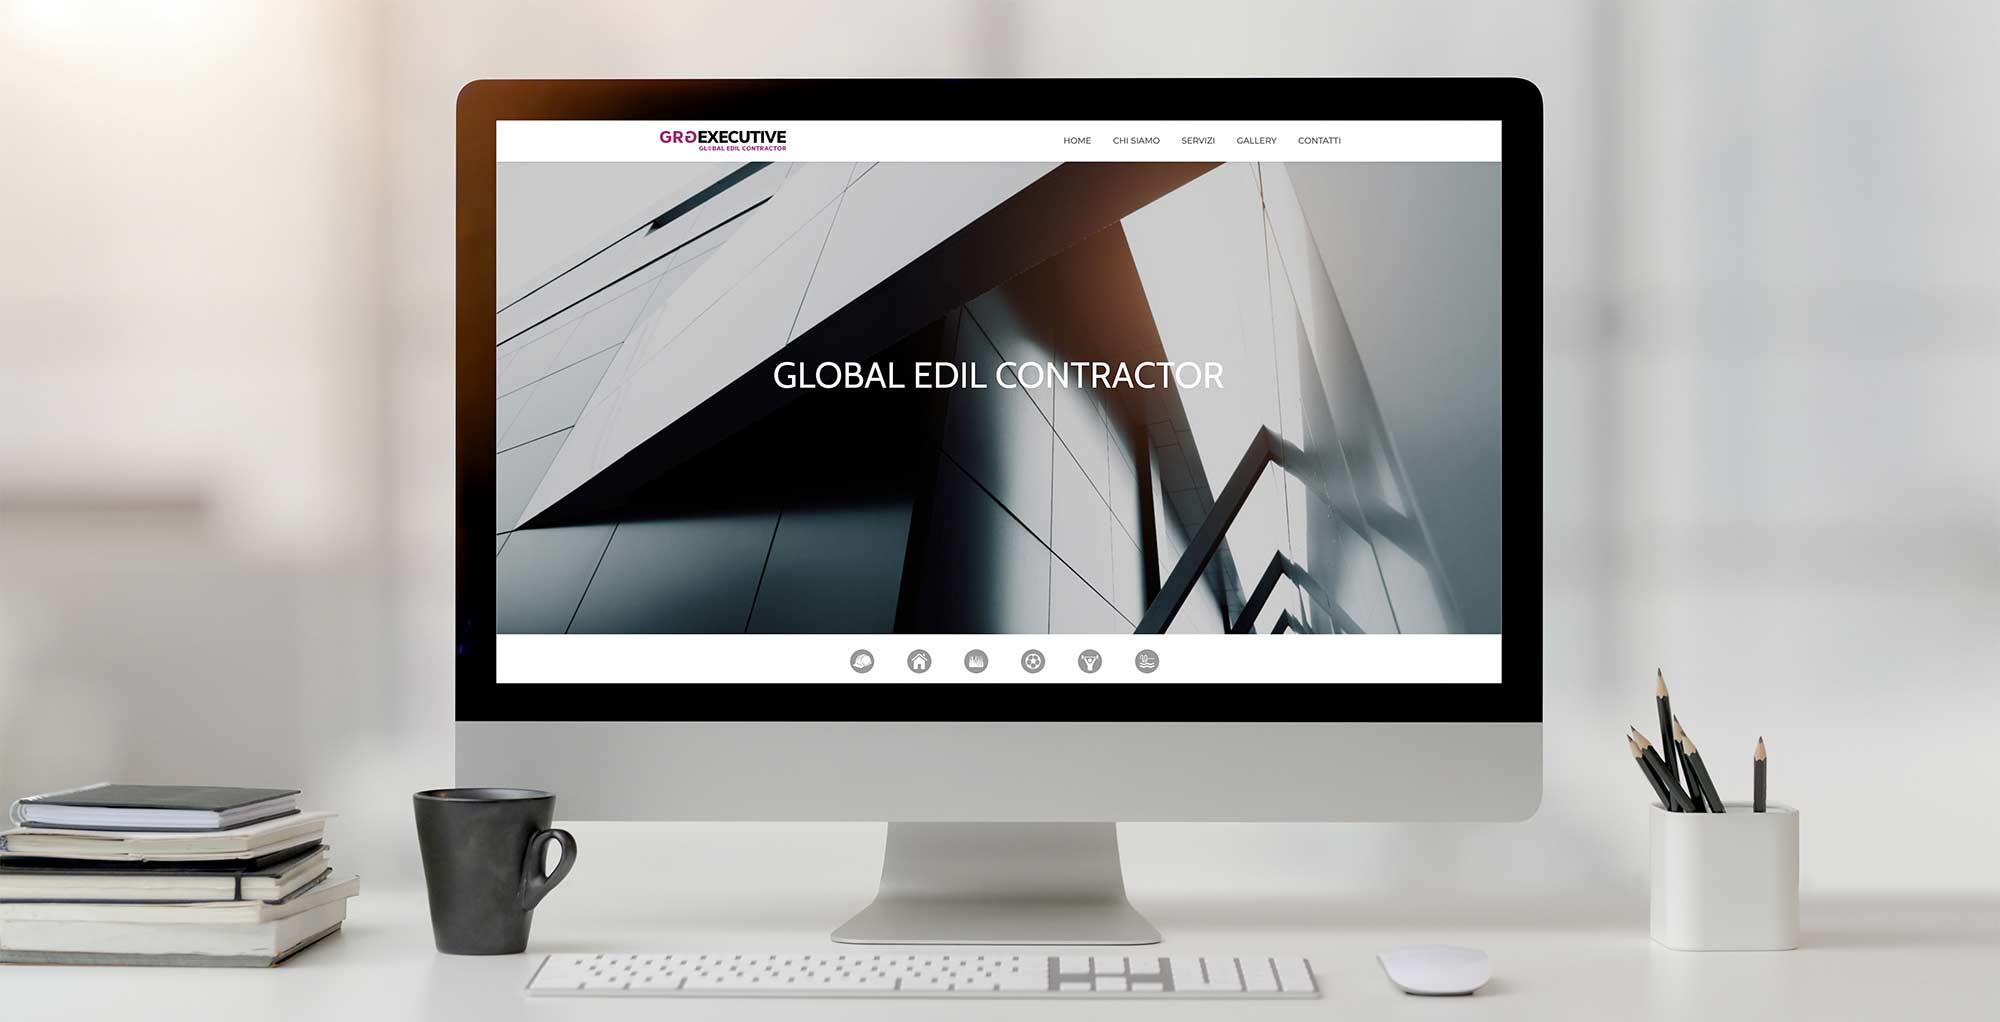 GRG Executive sito internet